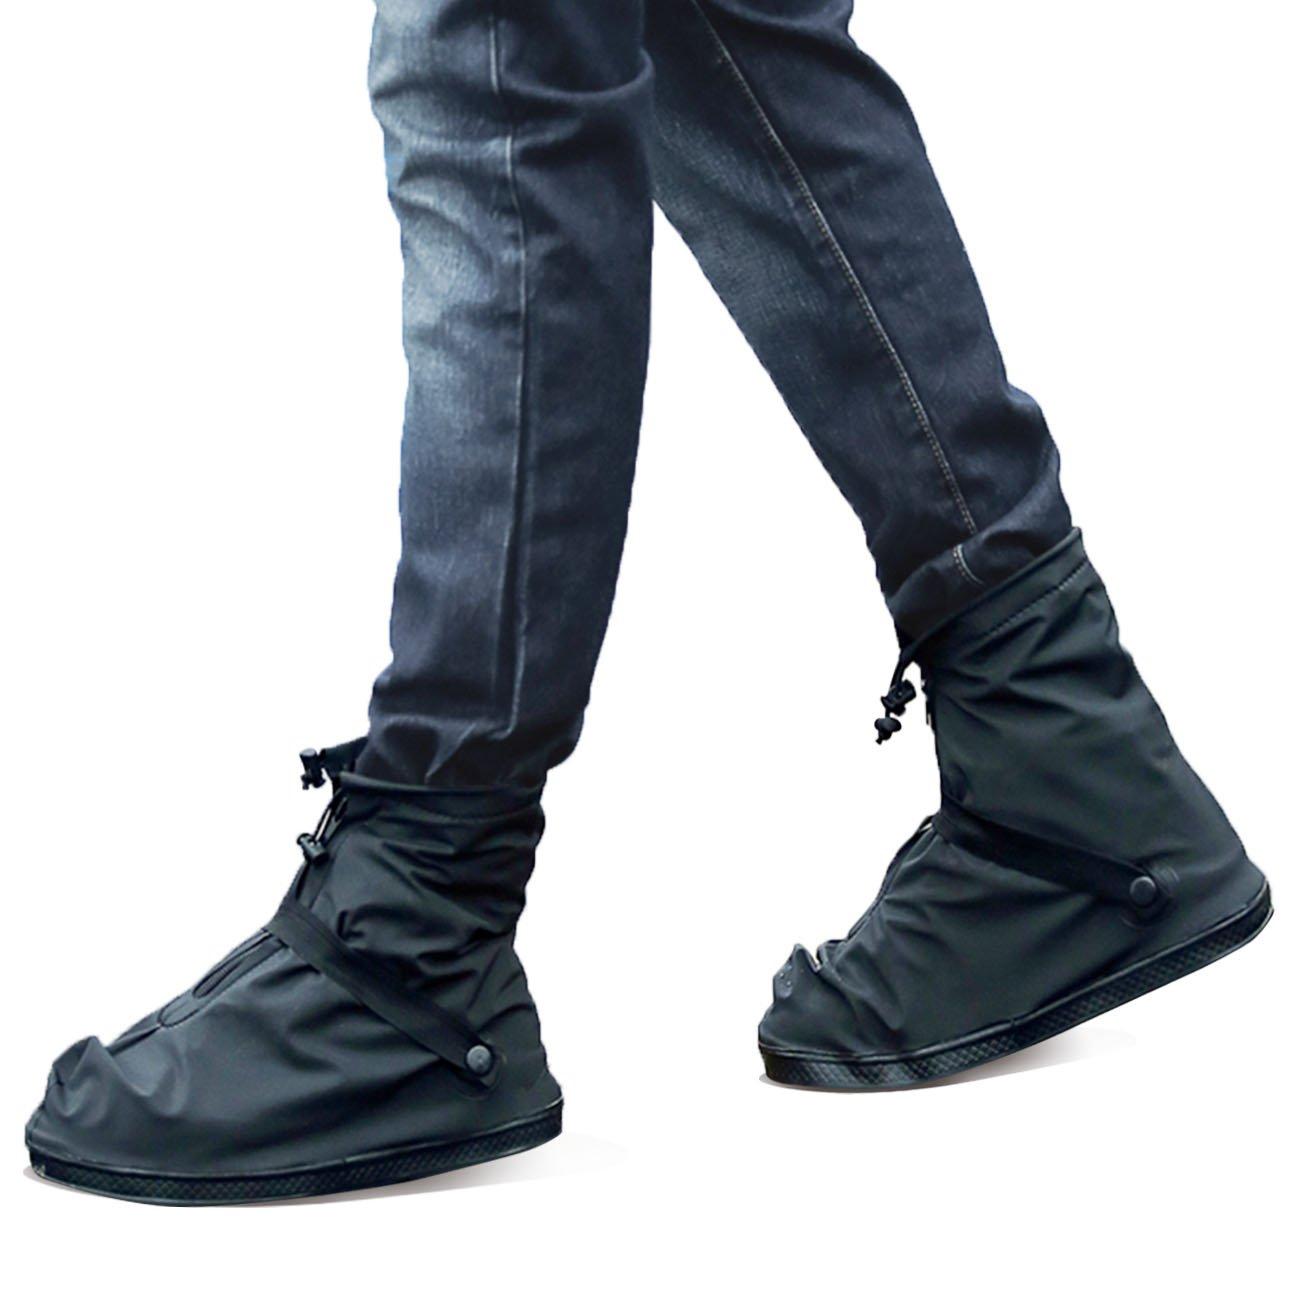 Life-C Black Waterproof Snow Rain Shoes Covers Women Men XXXXL by Life-C (Image #4)